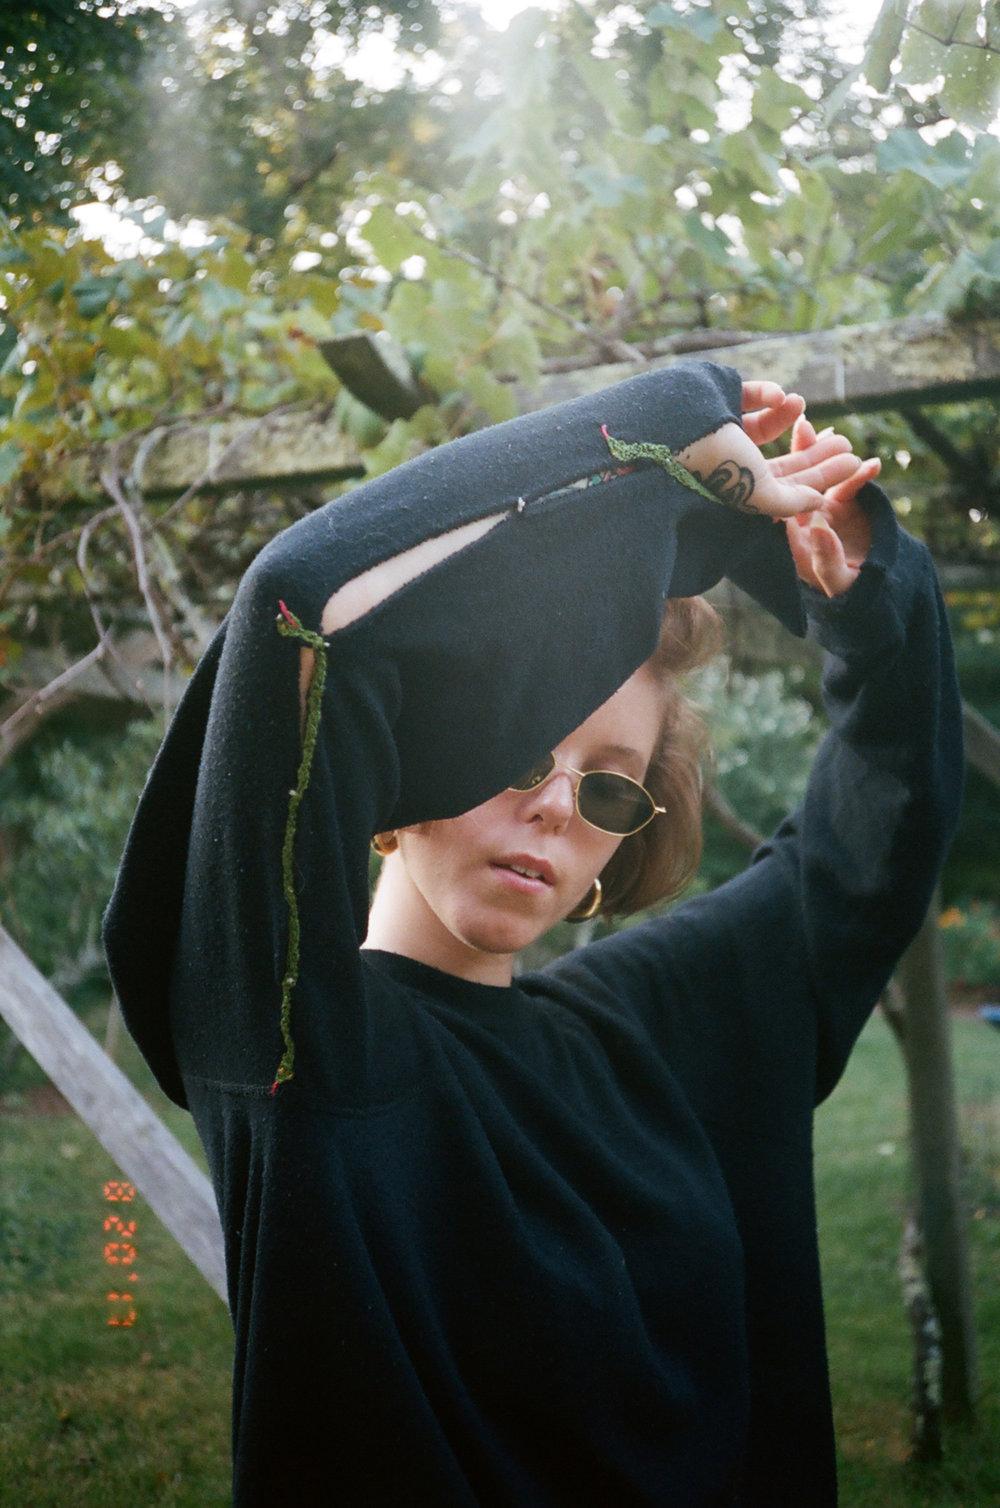 Liz McCormick in her Twin Snake sweatshirt.